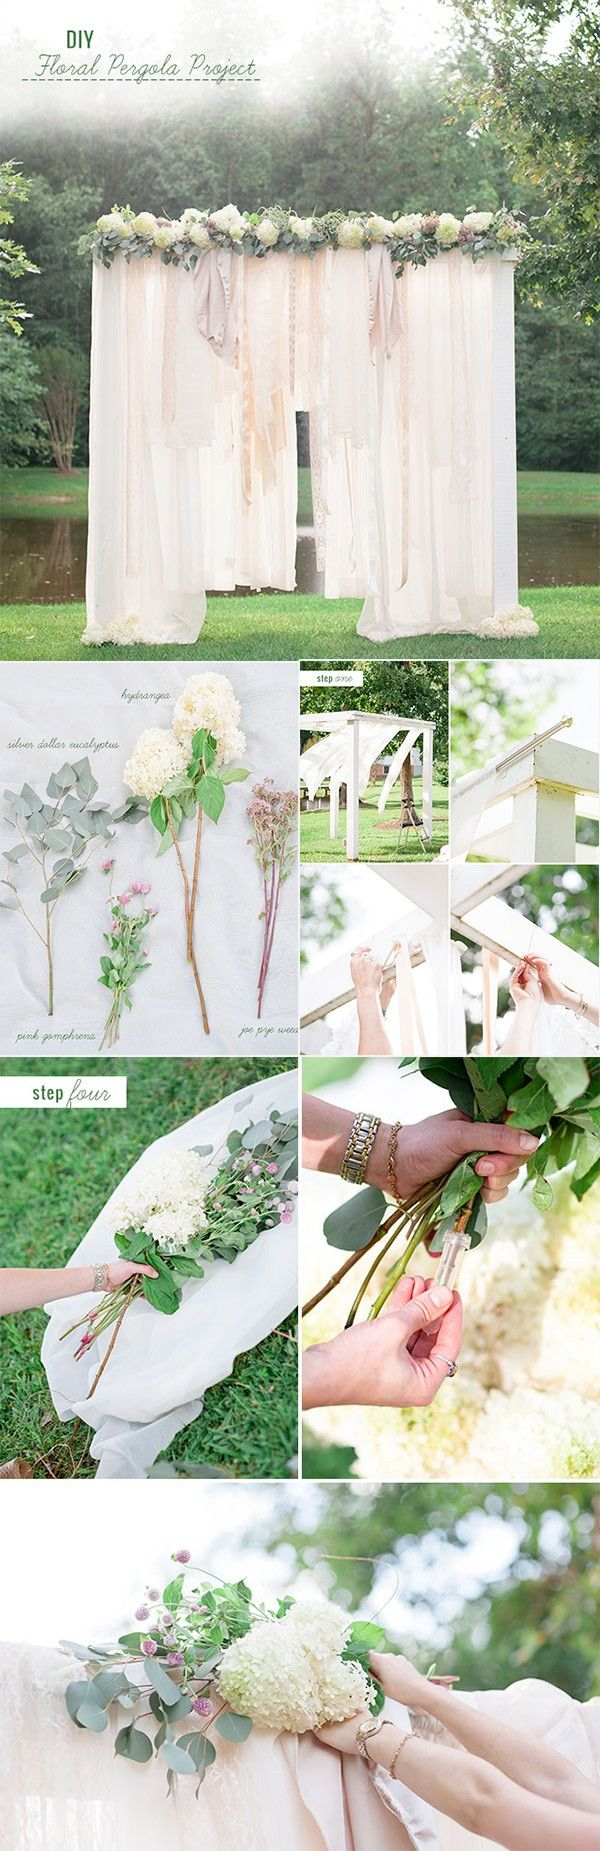 best 25 budget wedding decorations ideas on pinterest diy